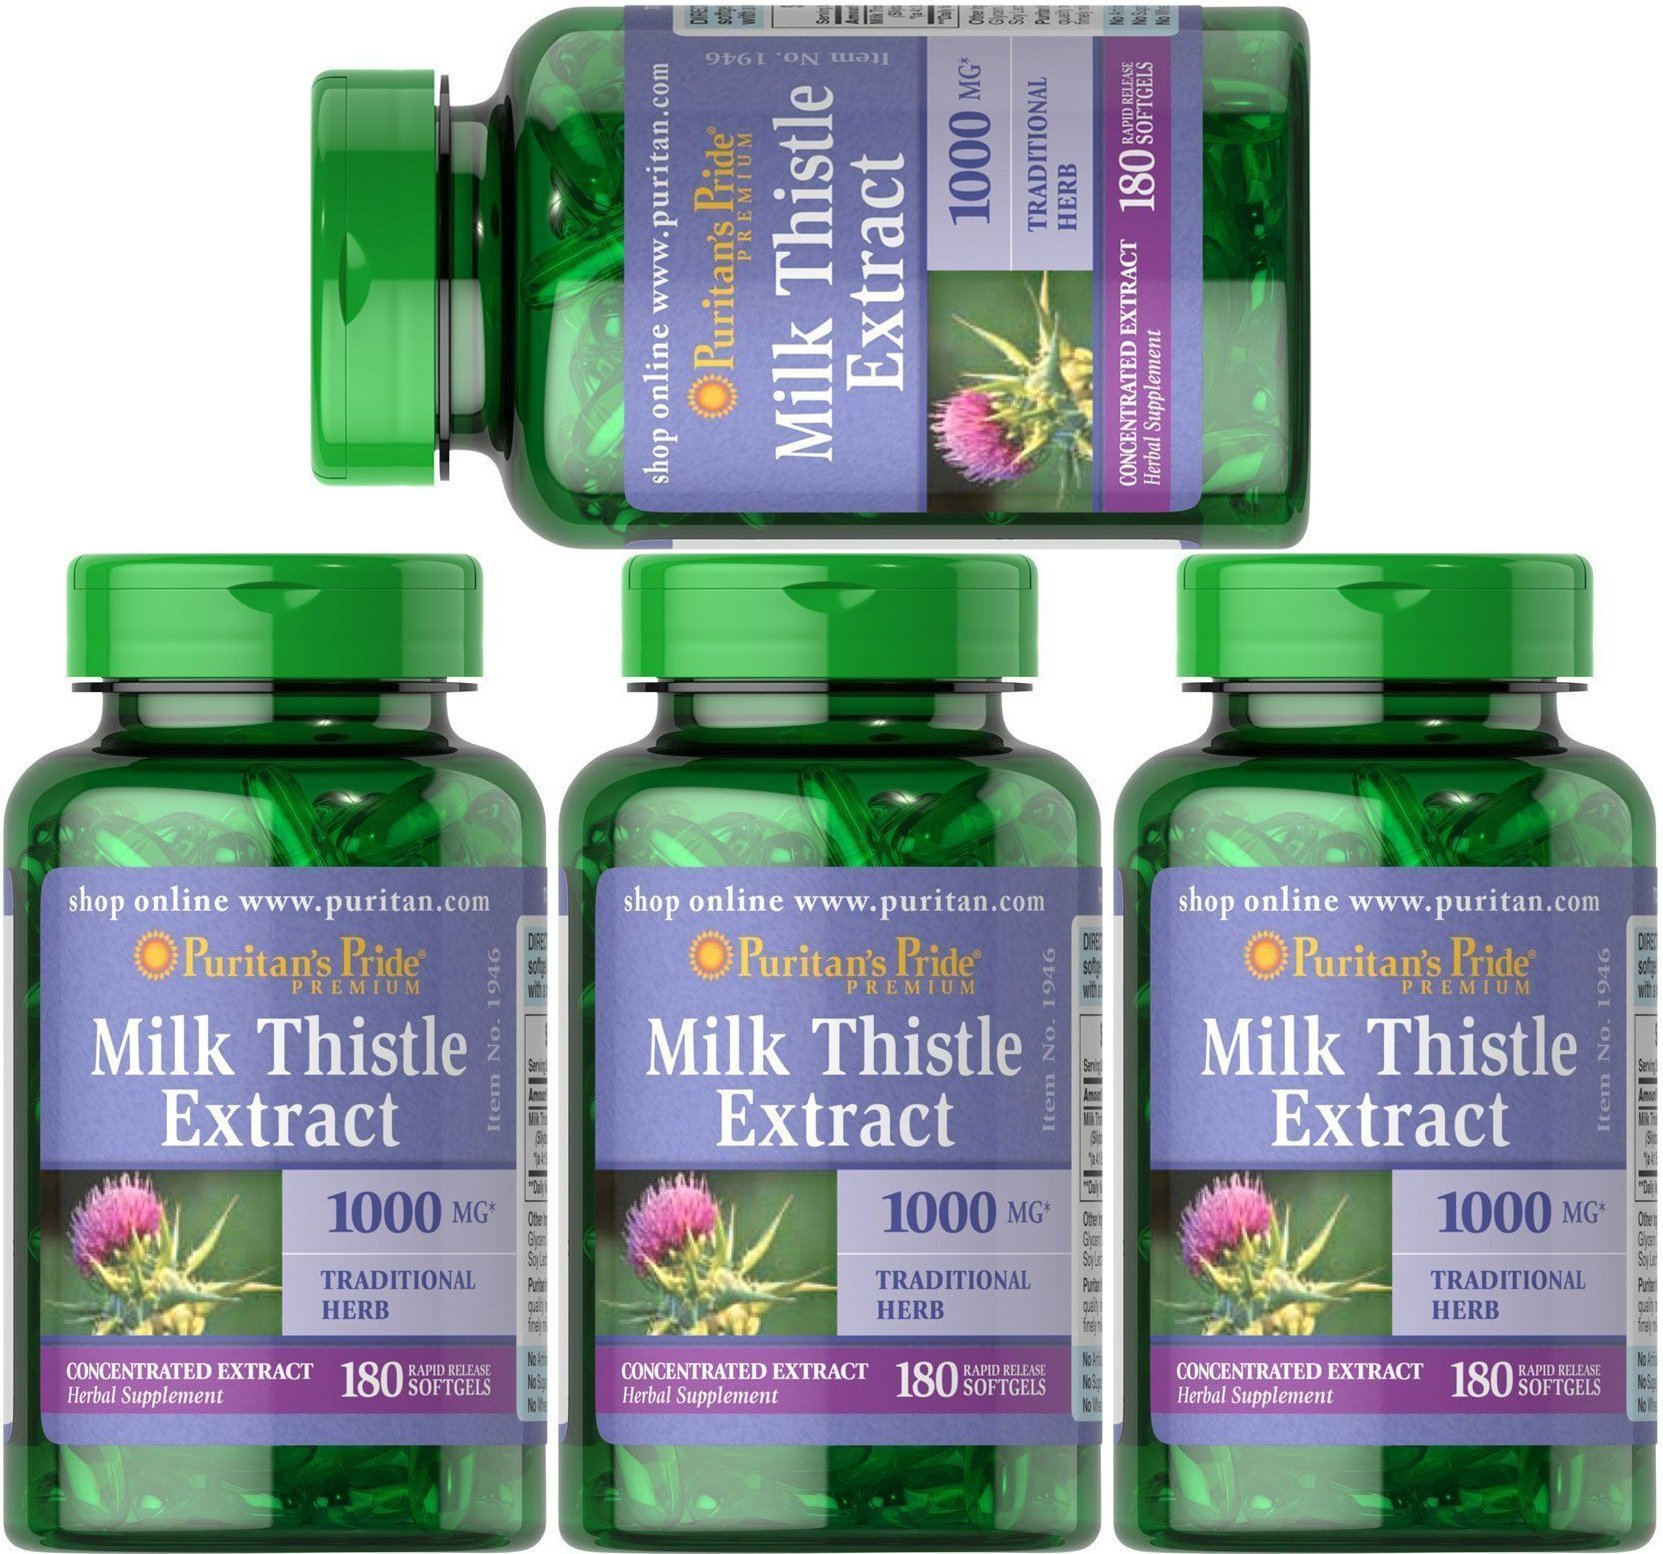 Puritan's Pride Milk Thistle 4:1 Extract 1000 mg (Silymarin)-180 Softgels (4)